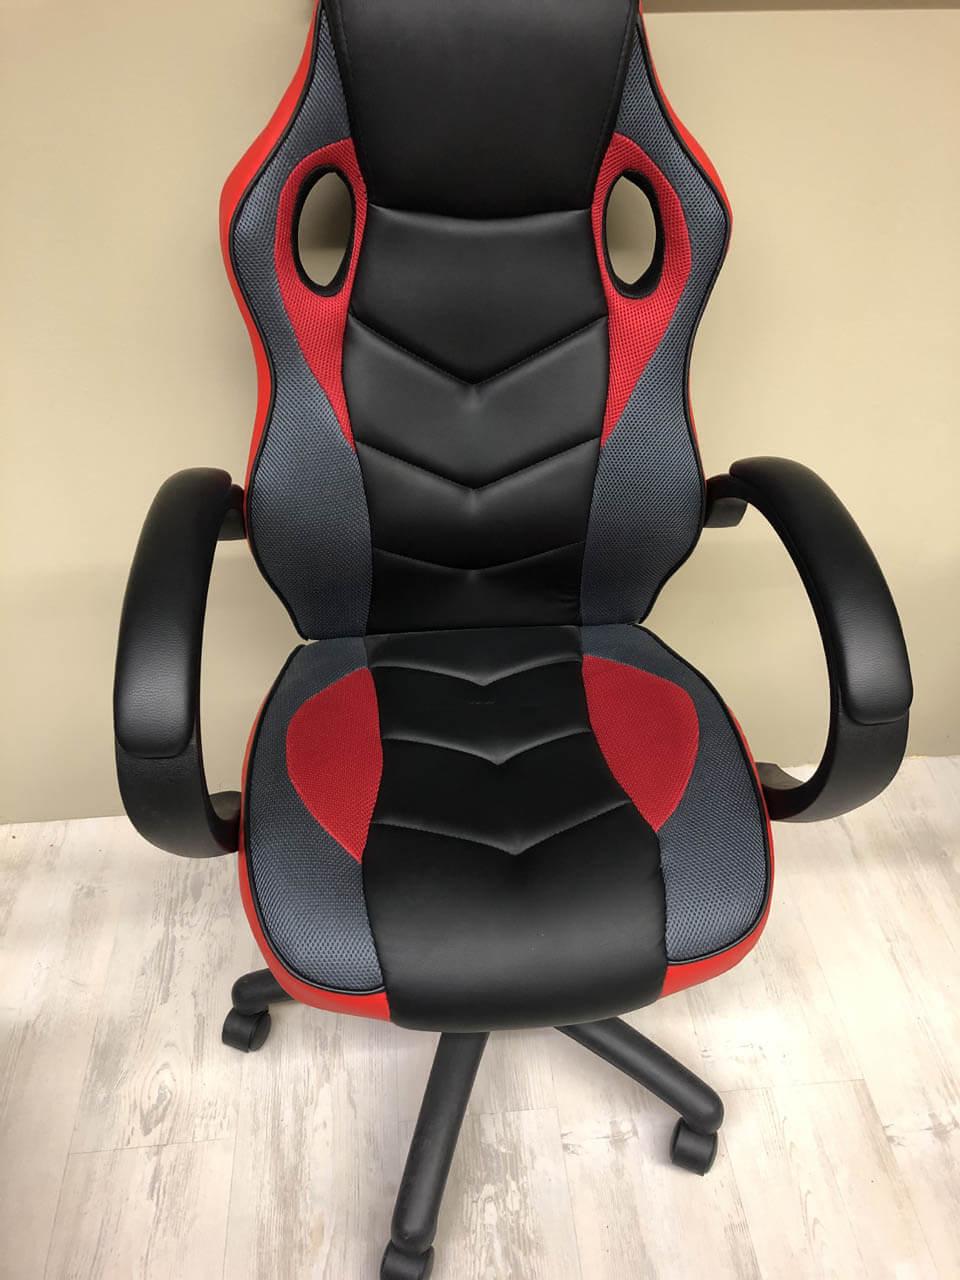 sedia-gaming-piodarredamenti